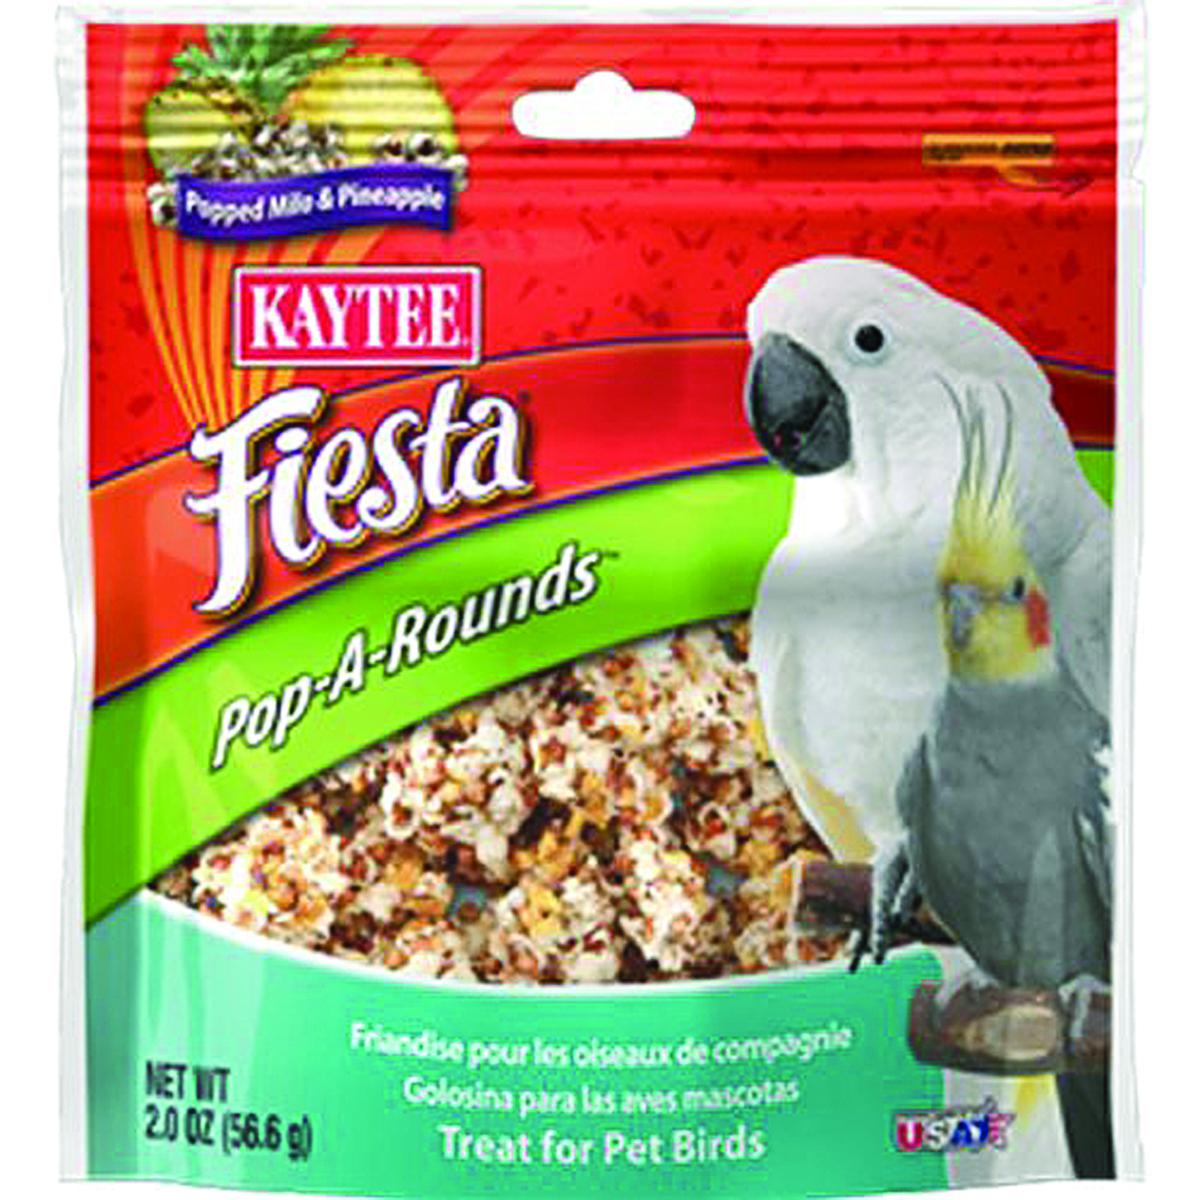 Kaytee Fiesta Pop-A-Rounds Treat - Pet Birds